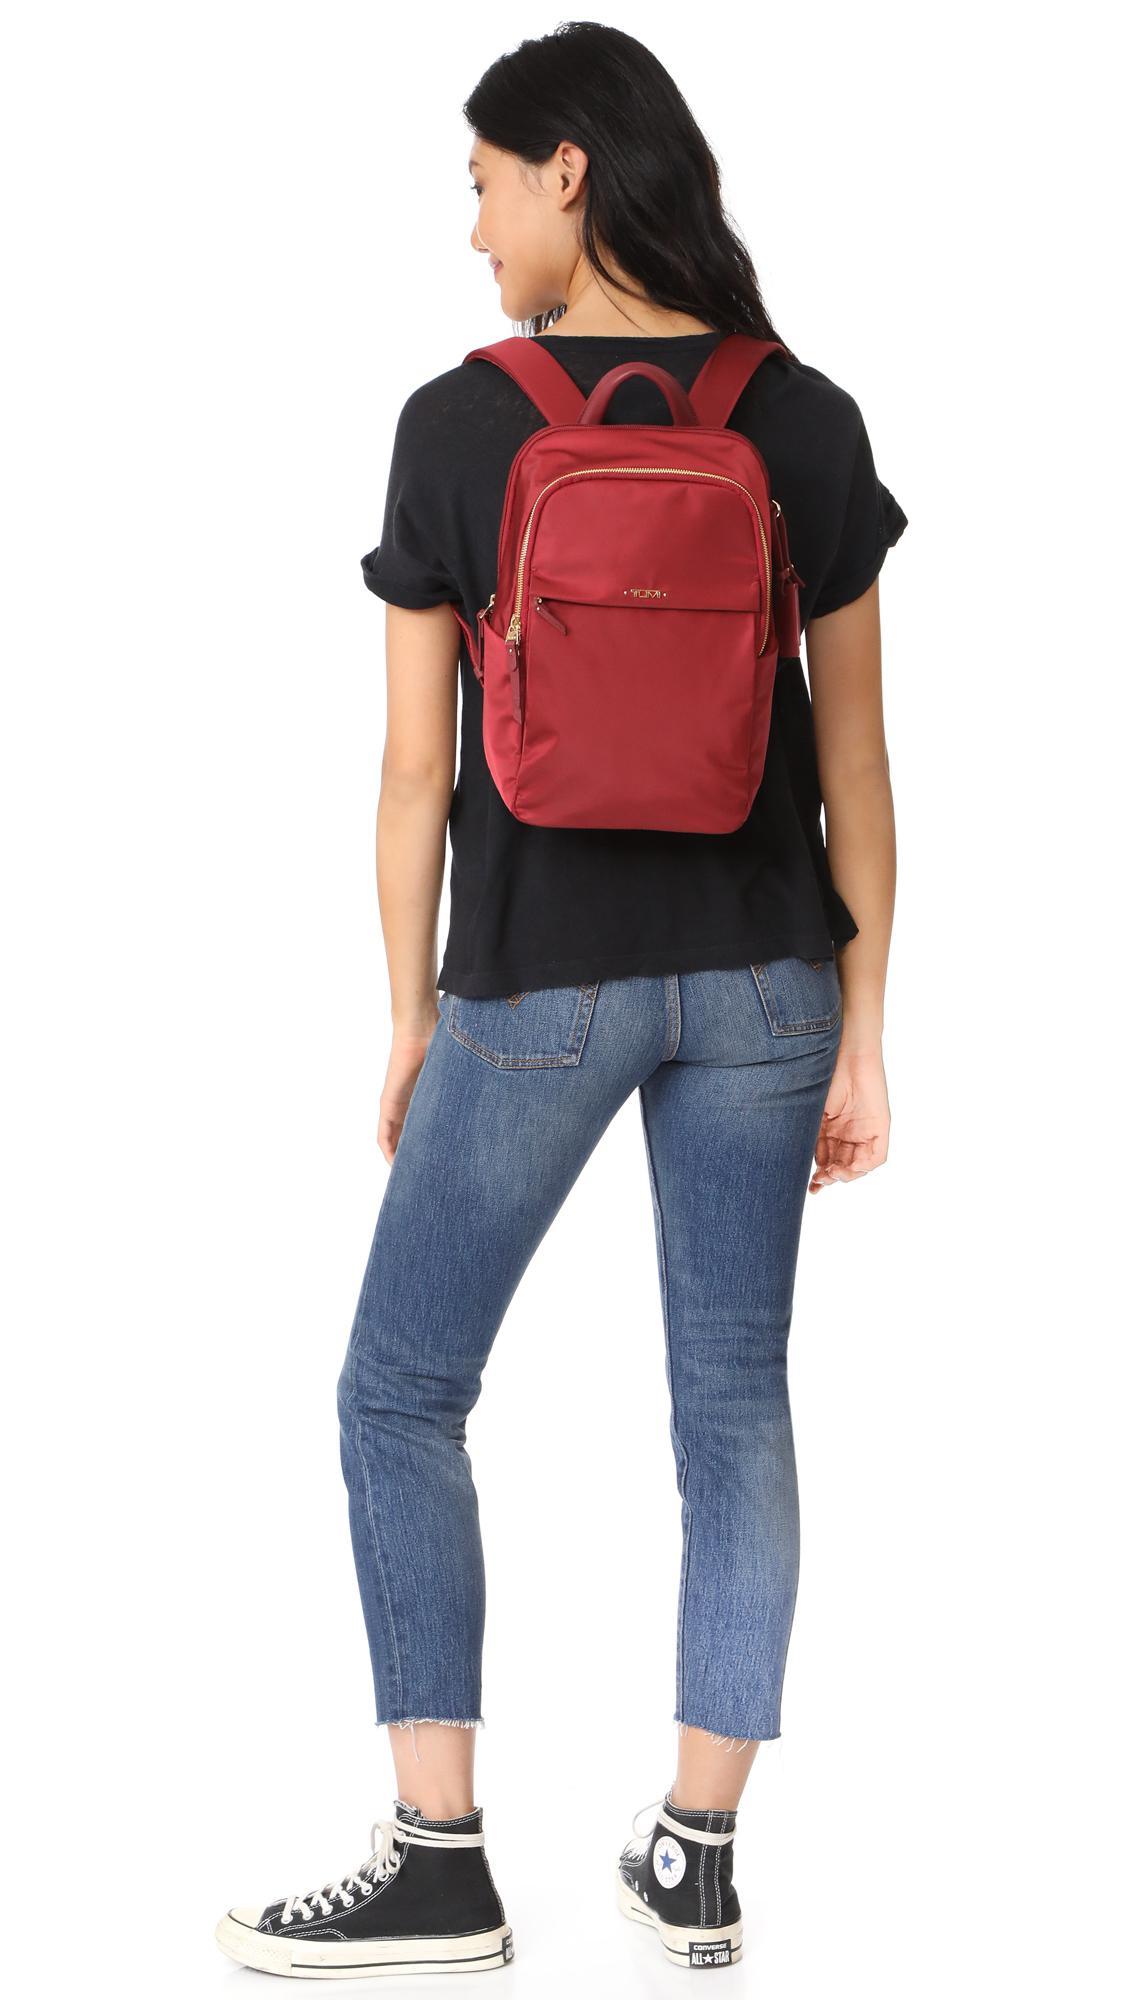 Lyst - Tumi Daniella Small Backpack in Red 92825101ea